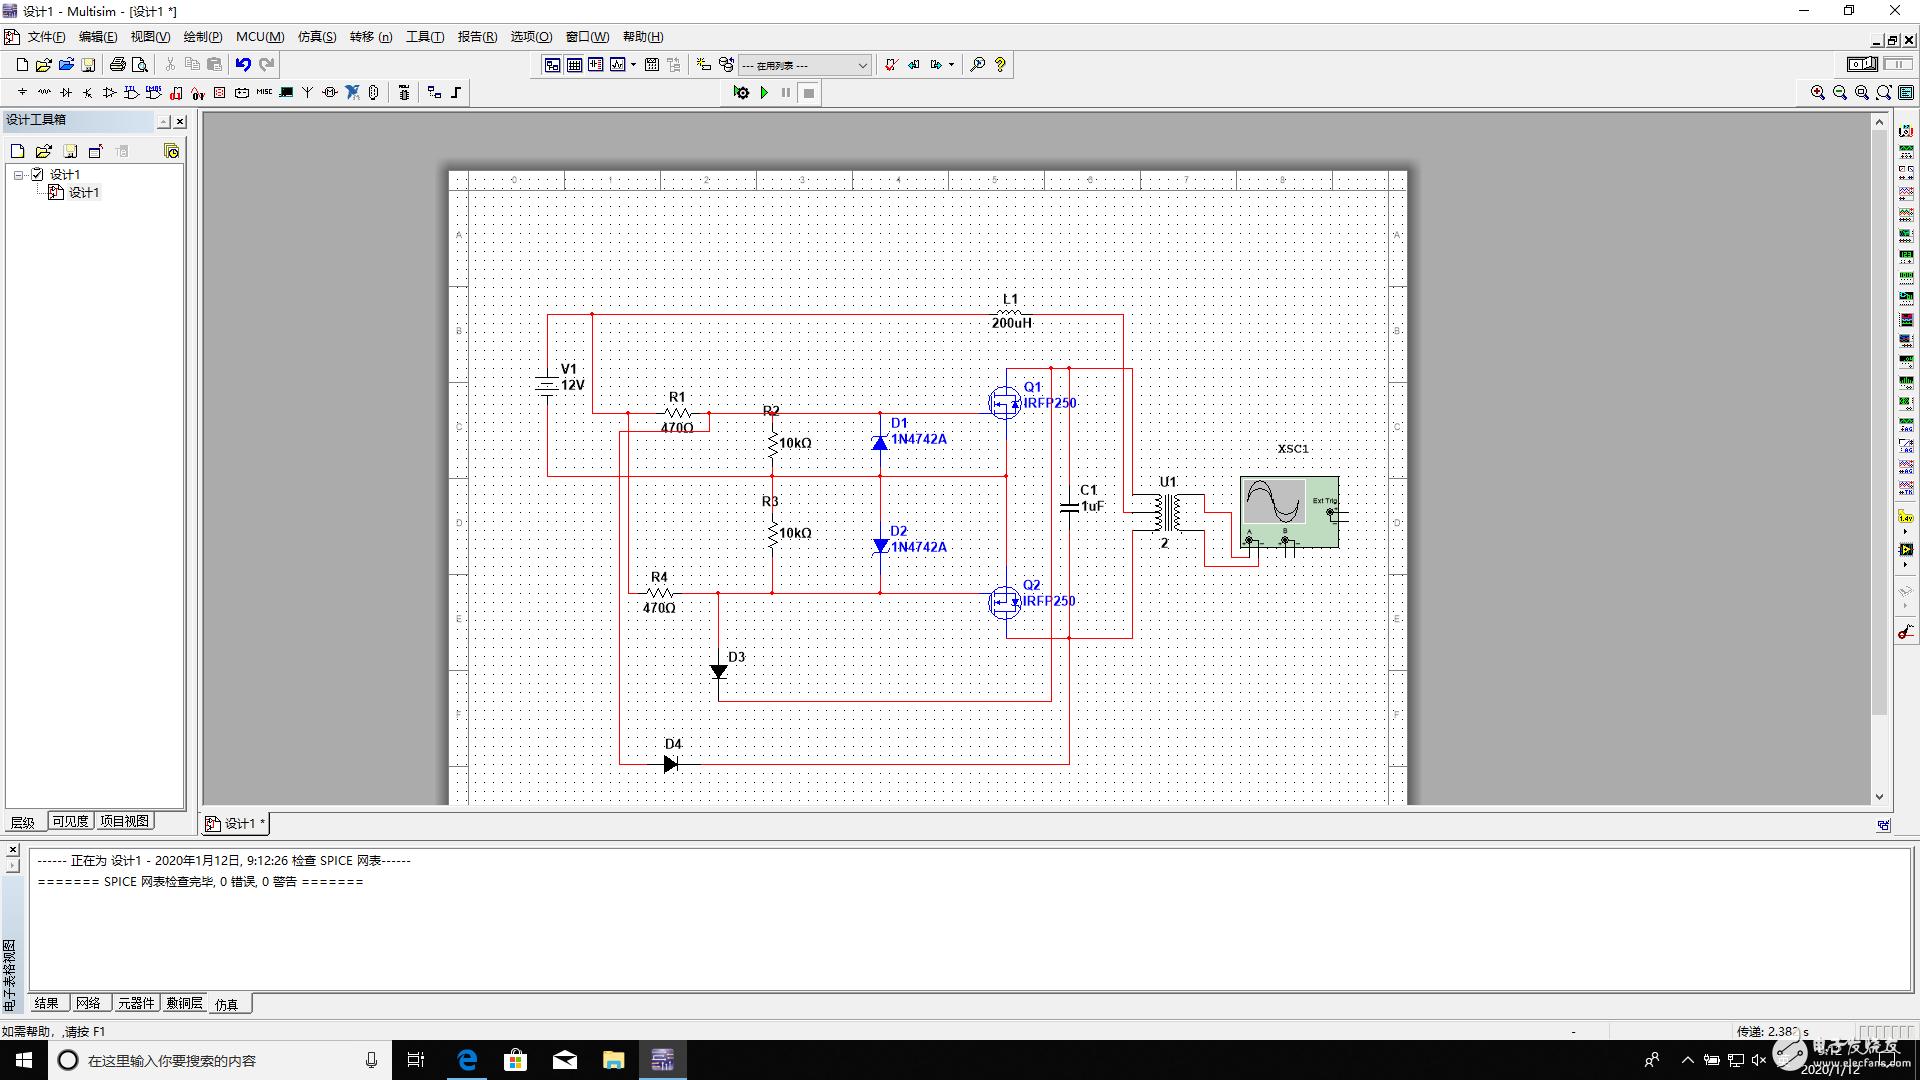 multisim13对直流升压推挽电路仿真模拟失败,请各位赐教